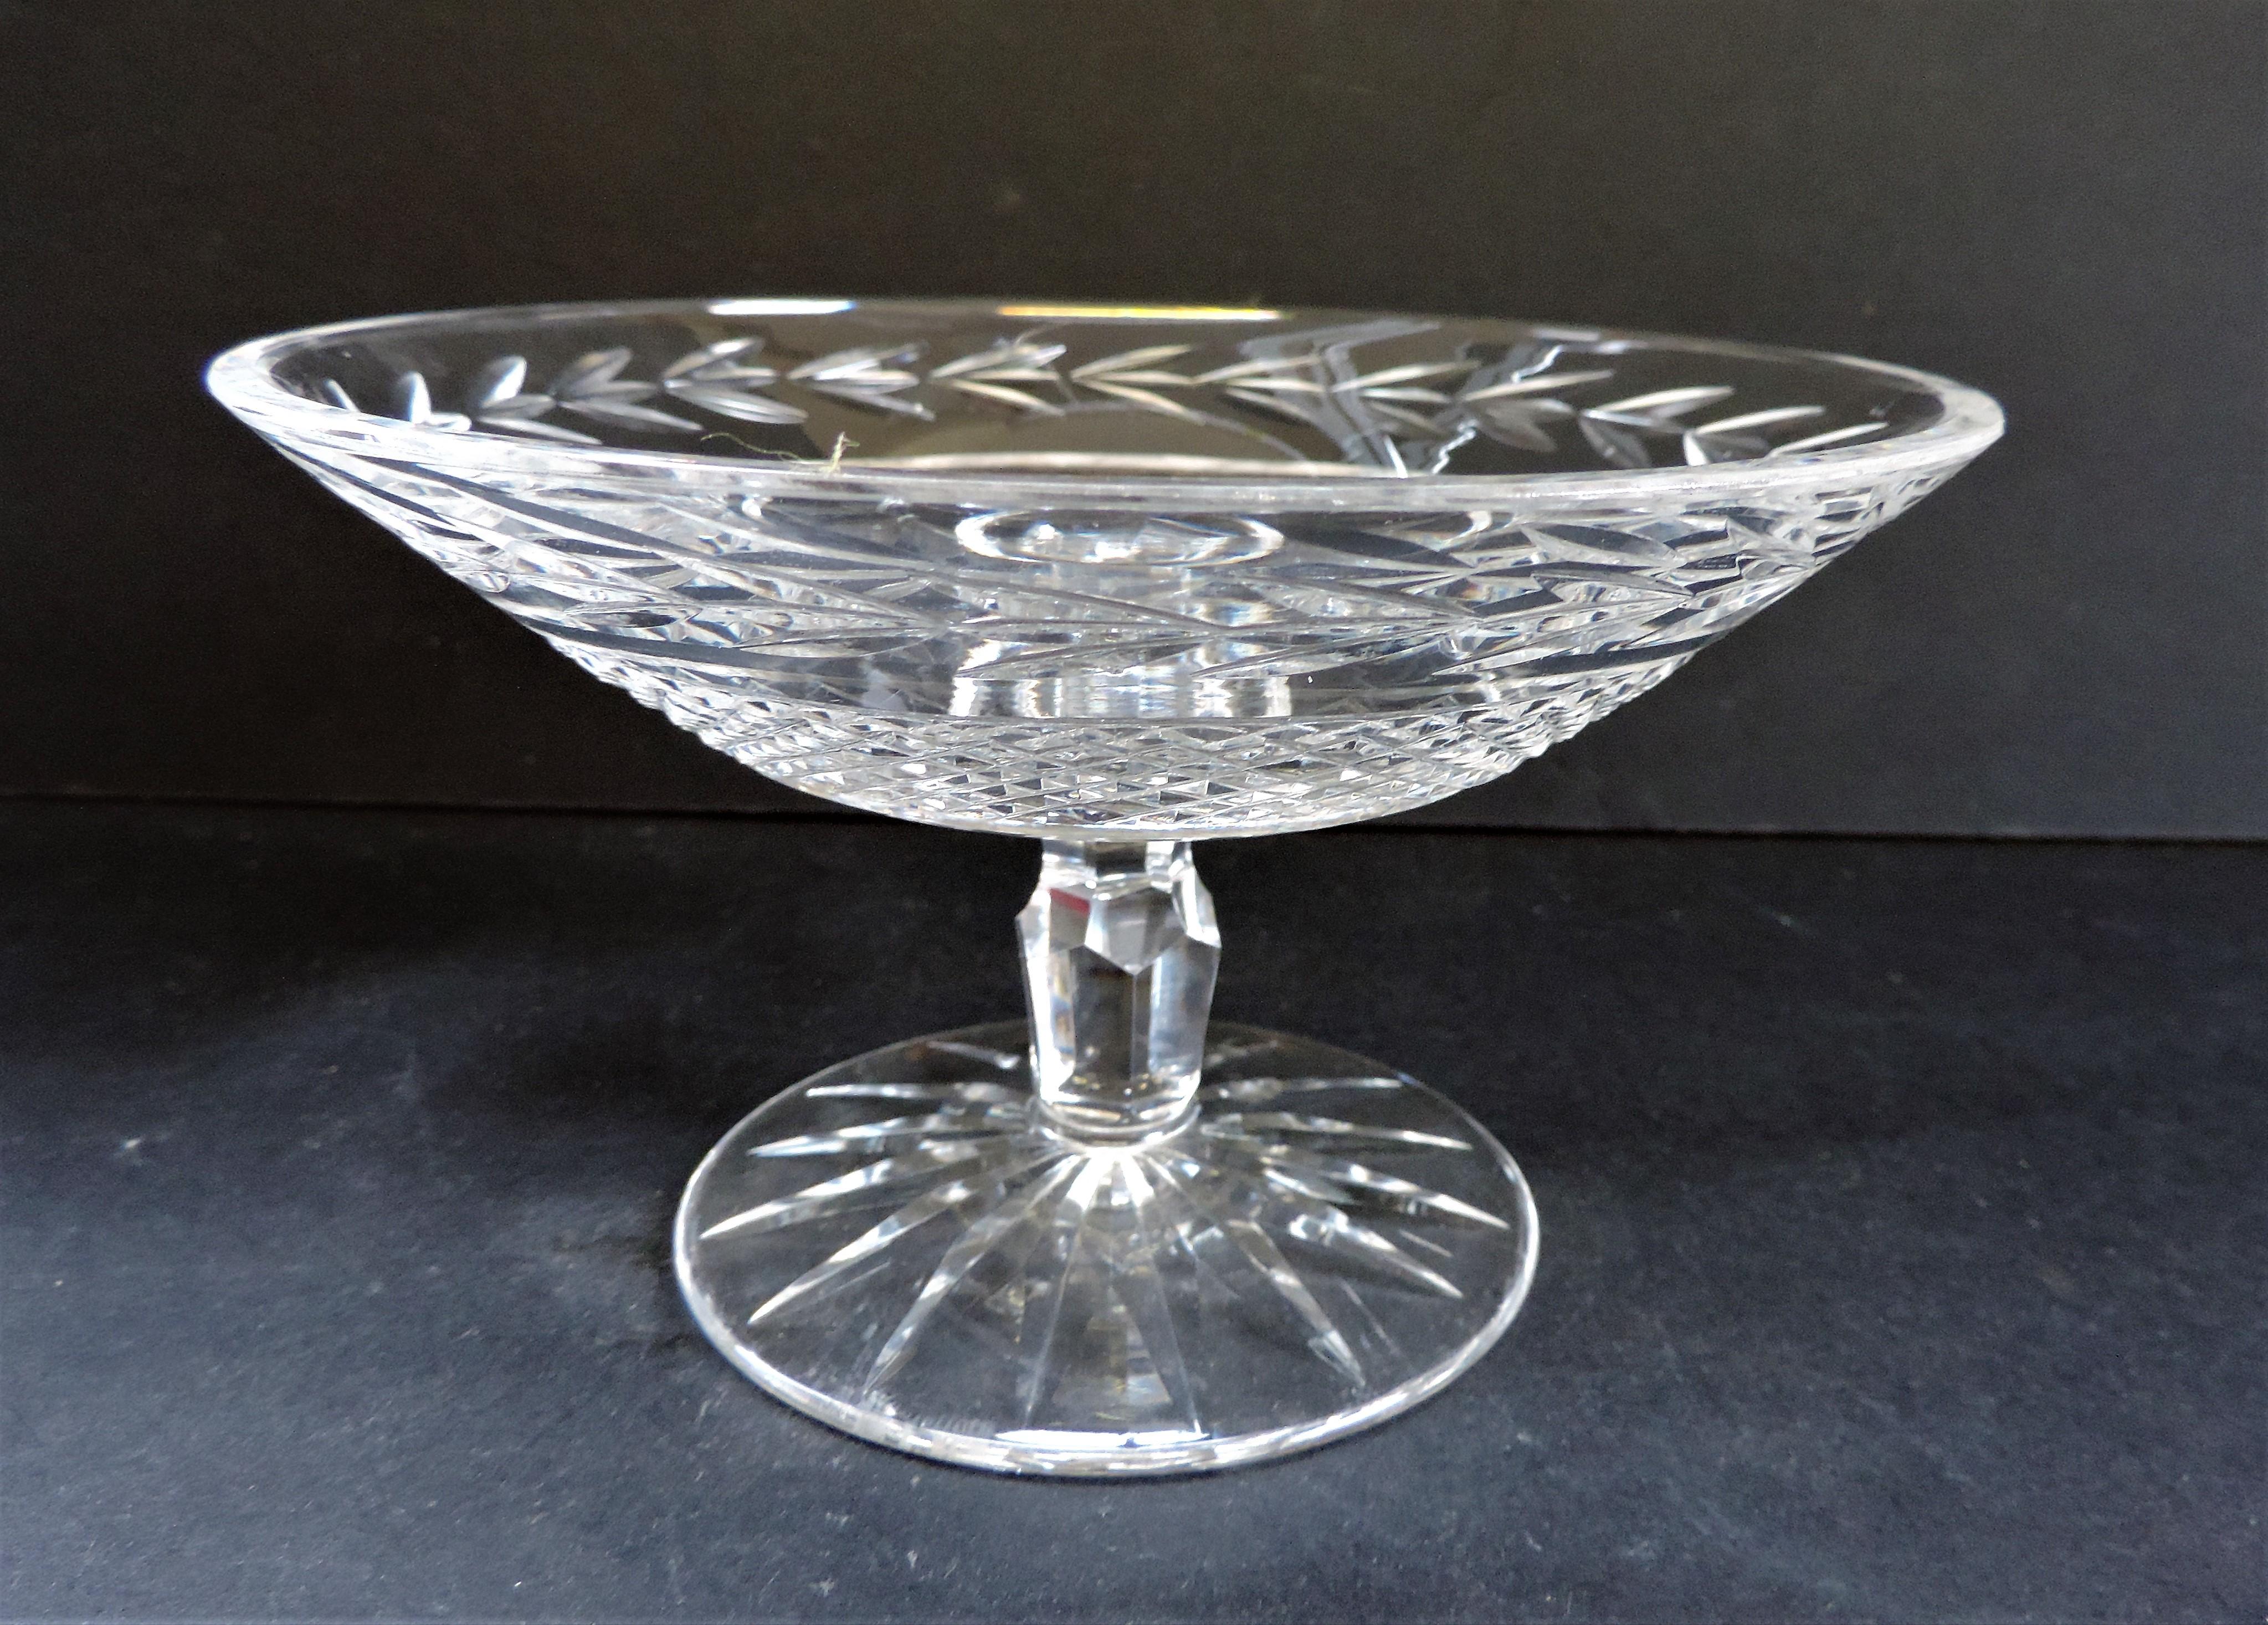 Vintage Val Saint Lambert Crystal Compote Dish - Image 3 of 5